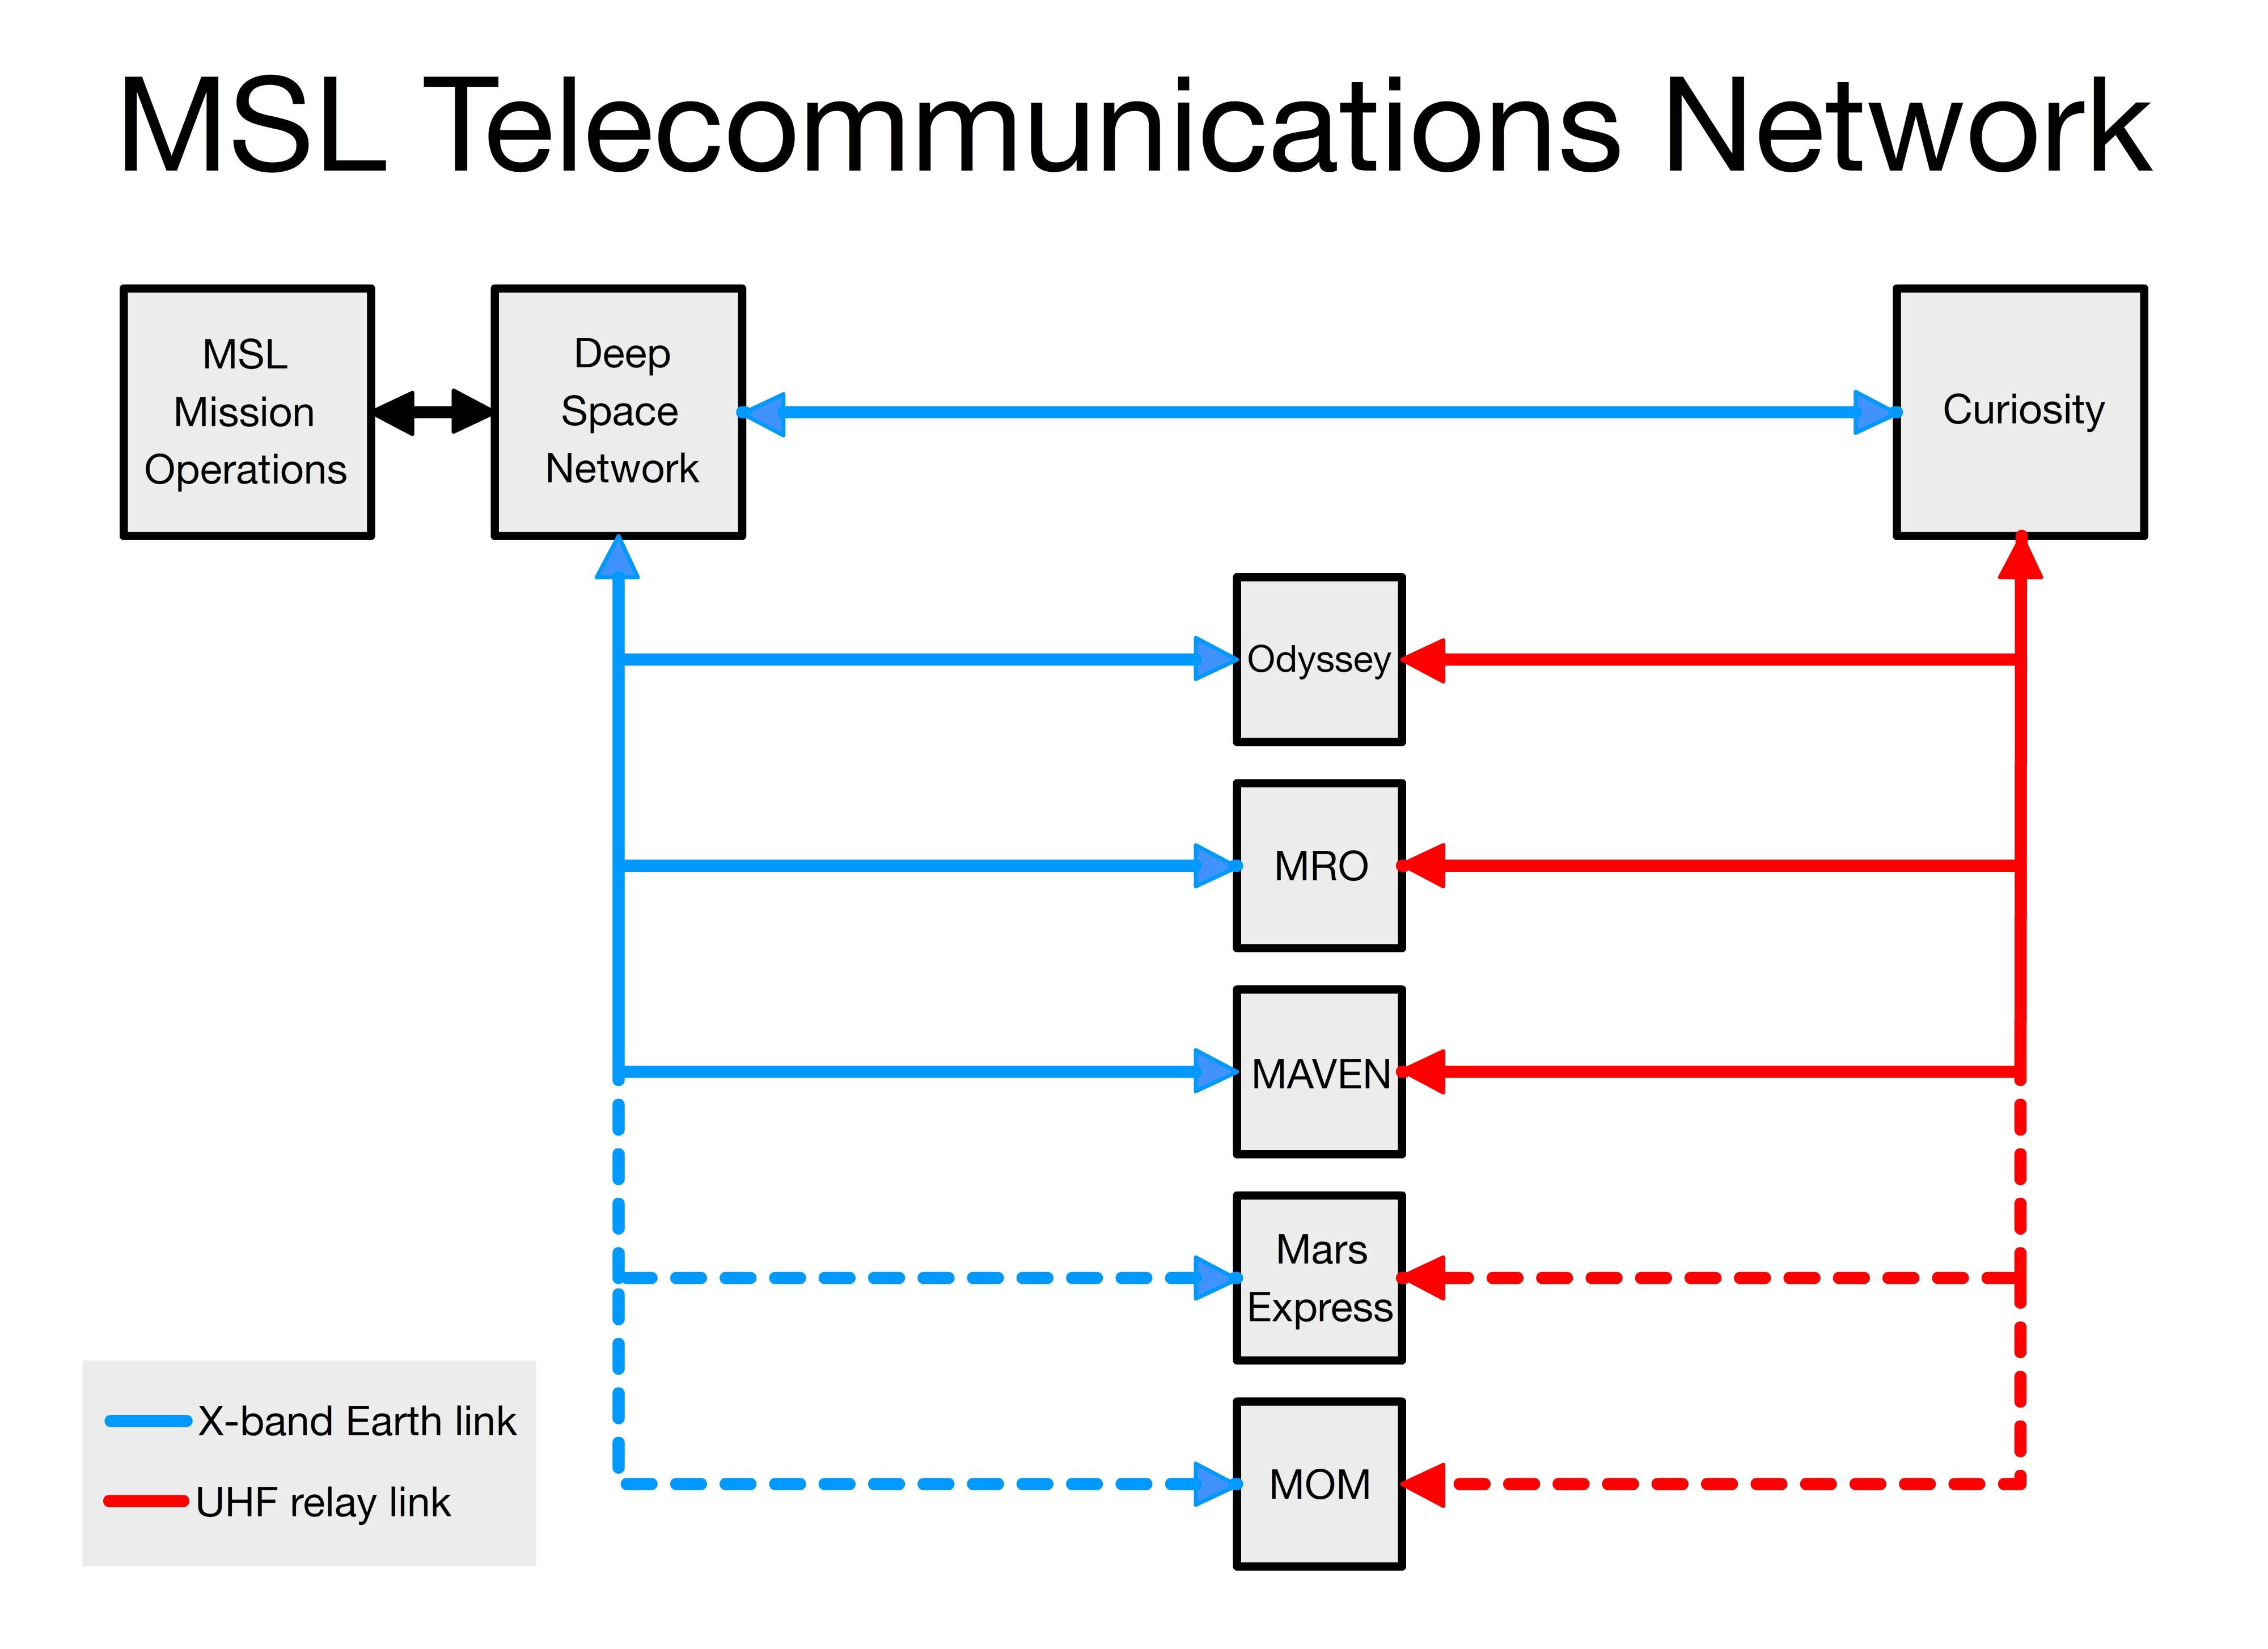 file:msl telecommunications network 2014 jpg